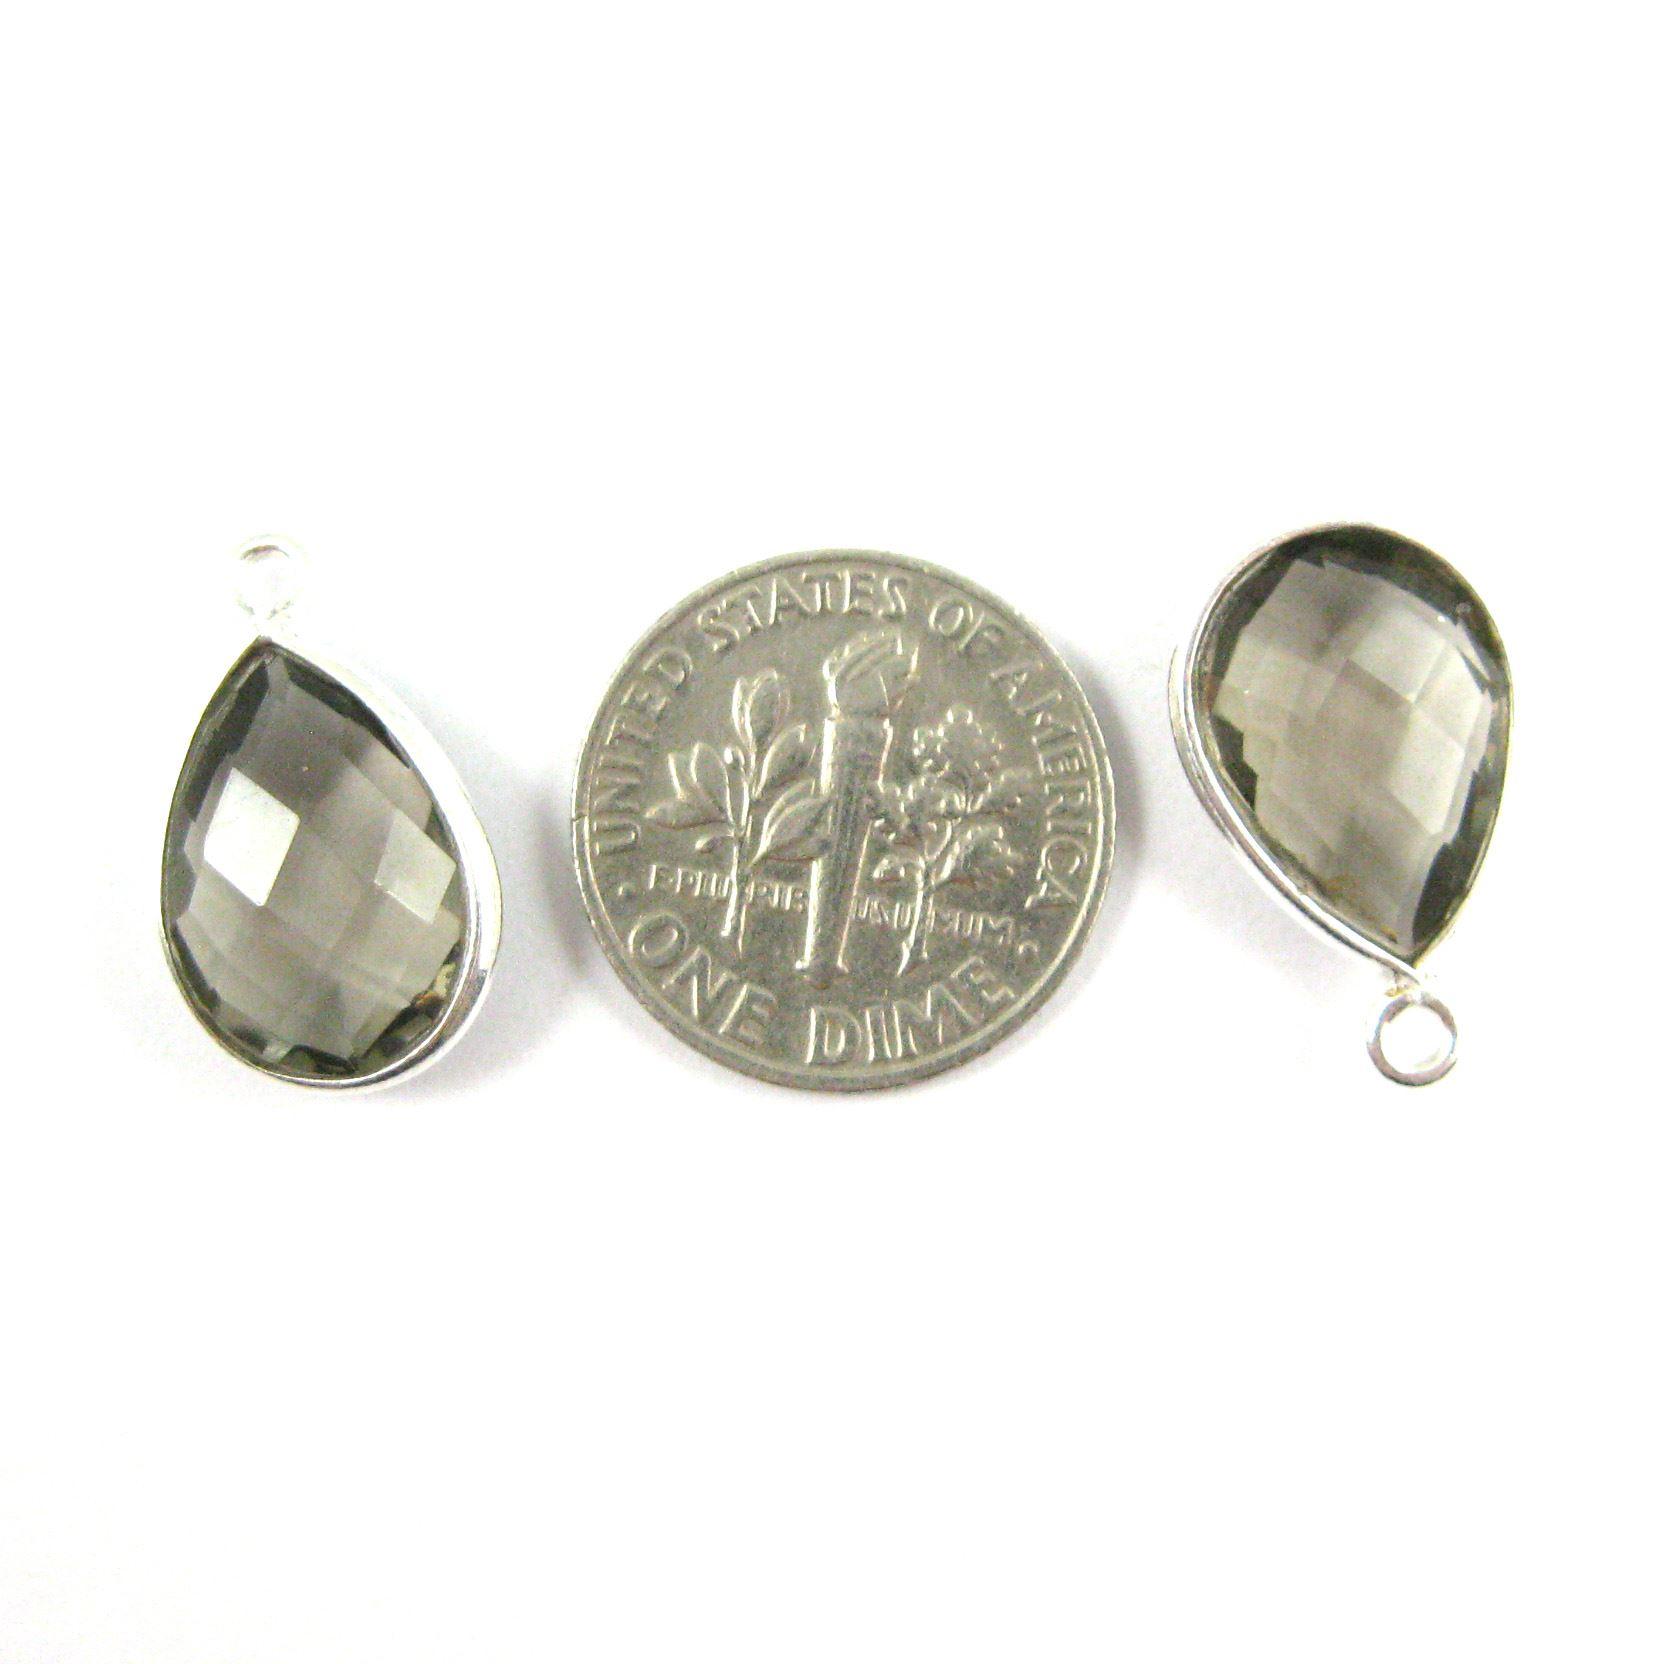 Bezel Gemstone Pendant -Sterling Silver Gem- 10x14mm Faceted Small Teardop Shape - Smokey Quartz (sold per 2 pieces)